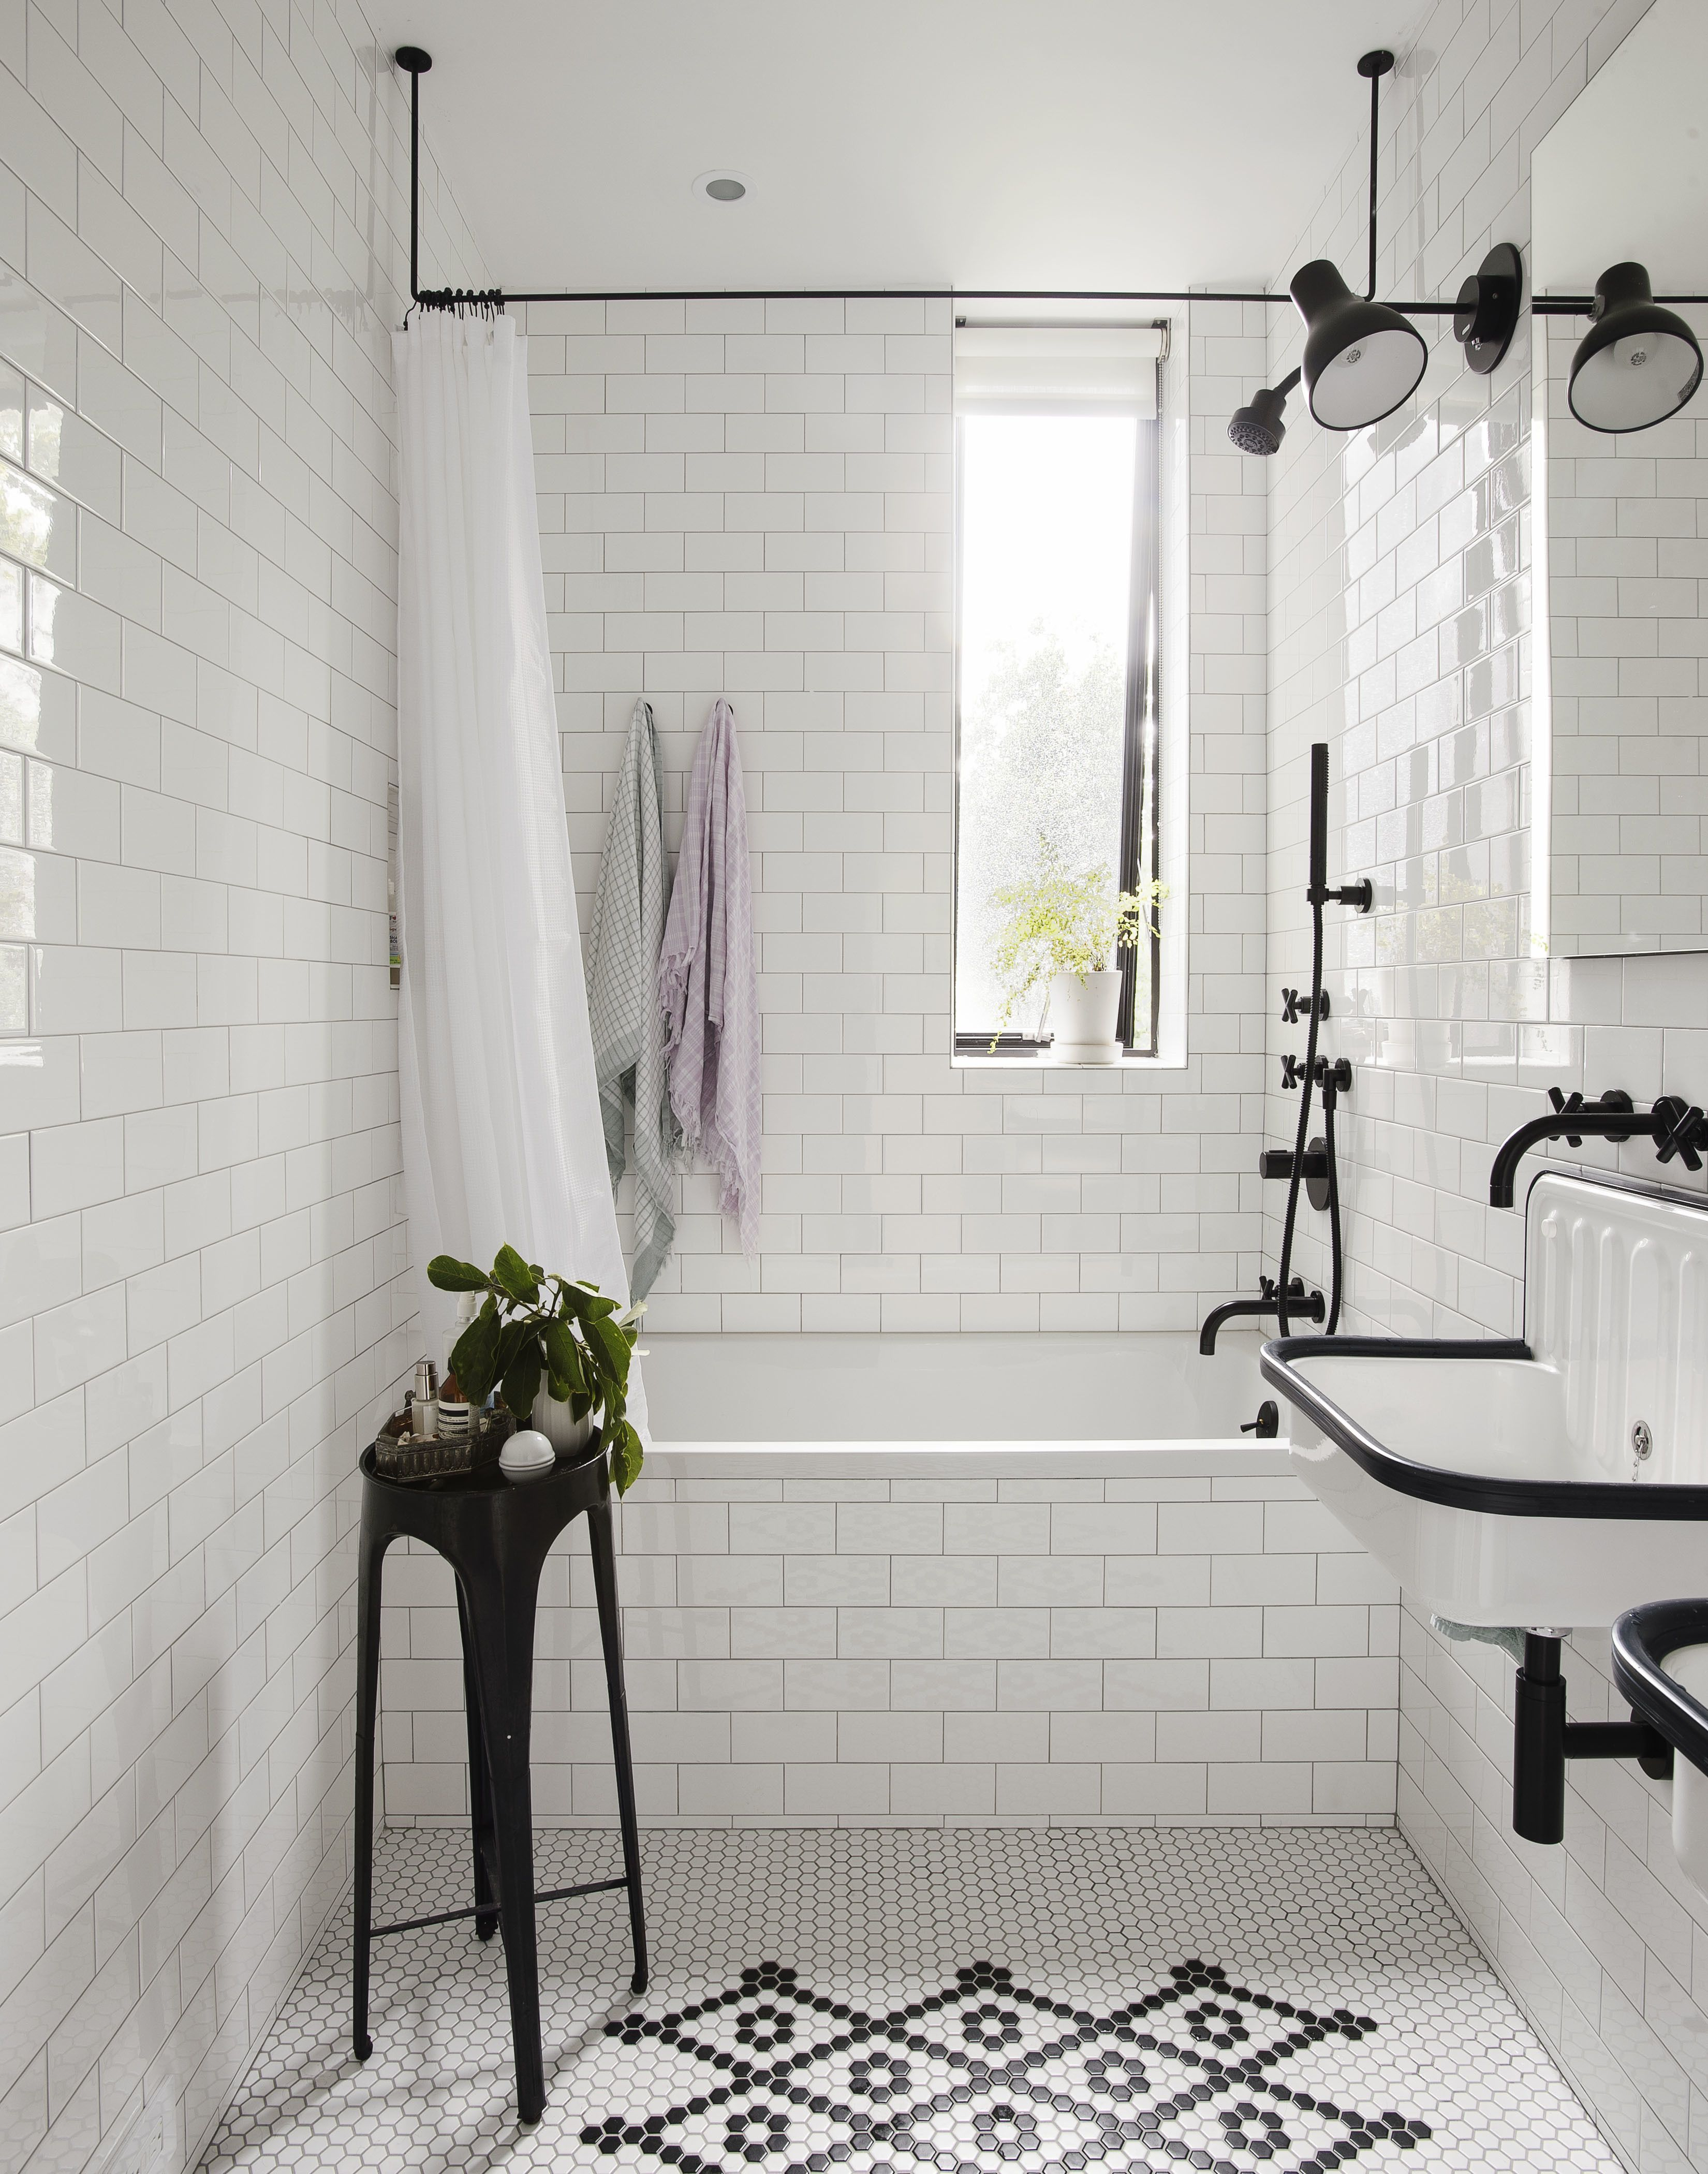 White Black Kids Bathroom Stool Table Ceiling Mounted Shower Curtain Rod Slender Window